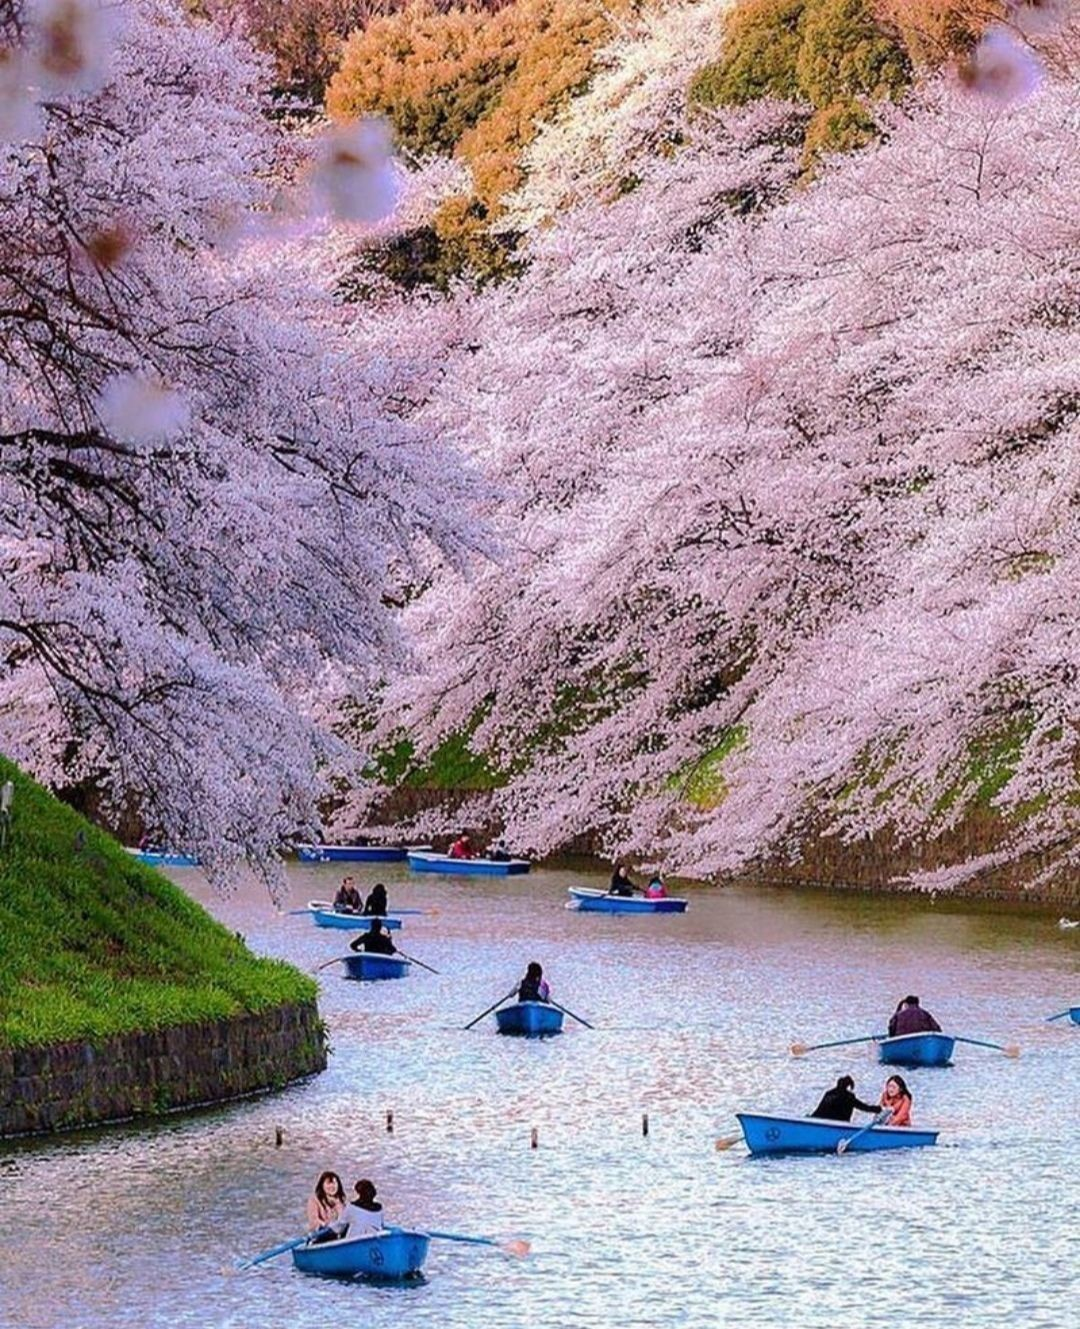 Pin By Aureliana Santos On Asia Beautiful Places To Visit Amazing Travel Destinations Tokyo Photos